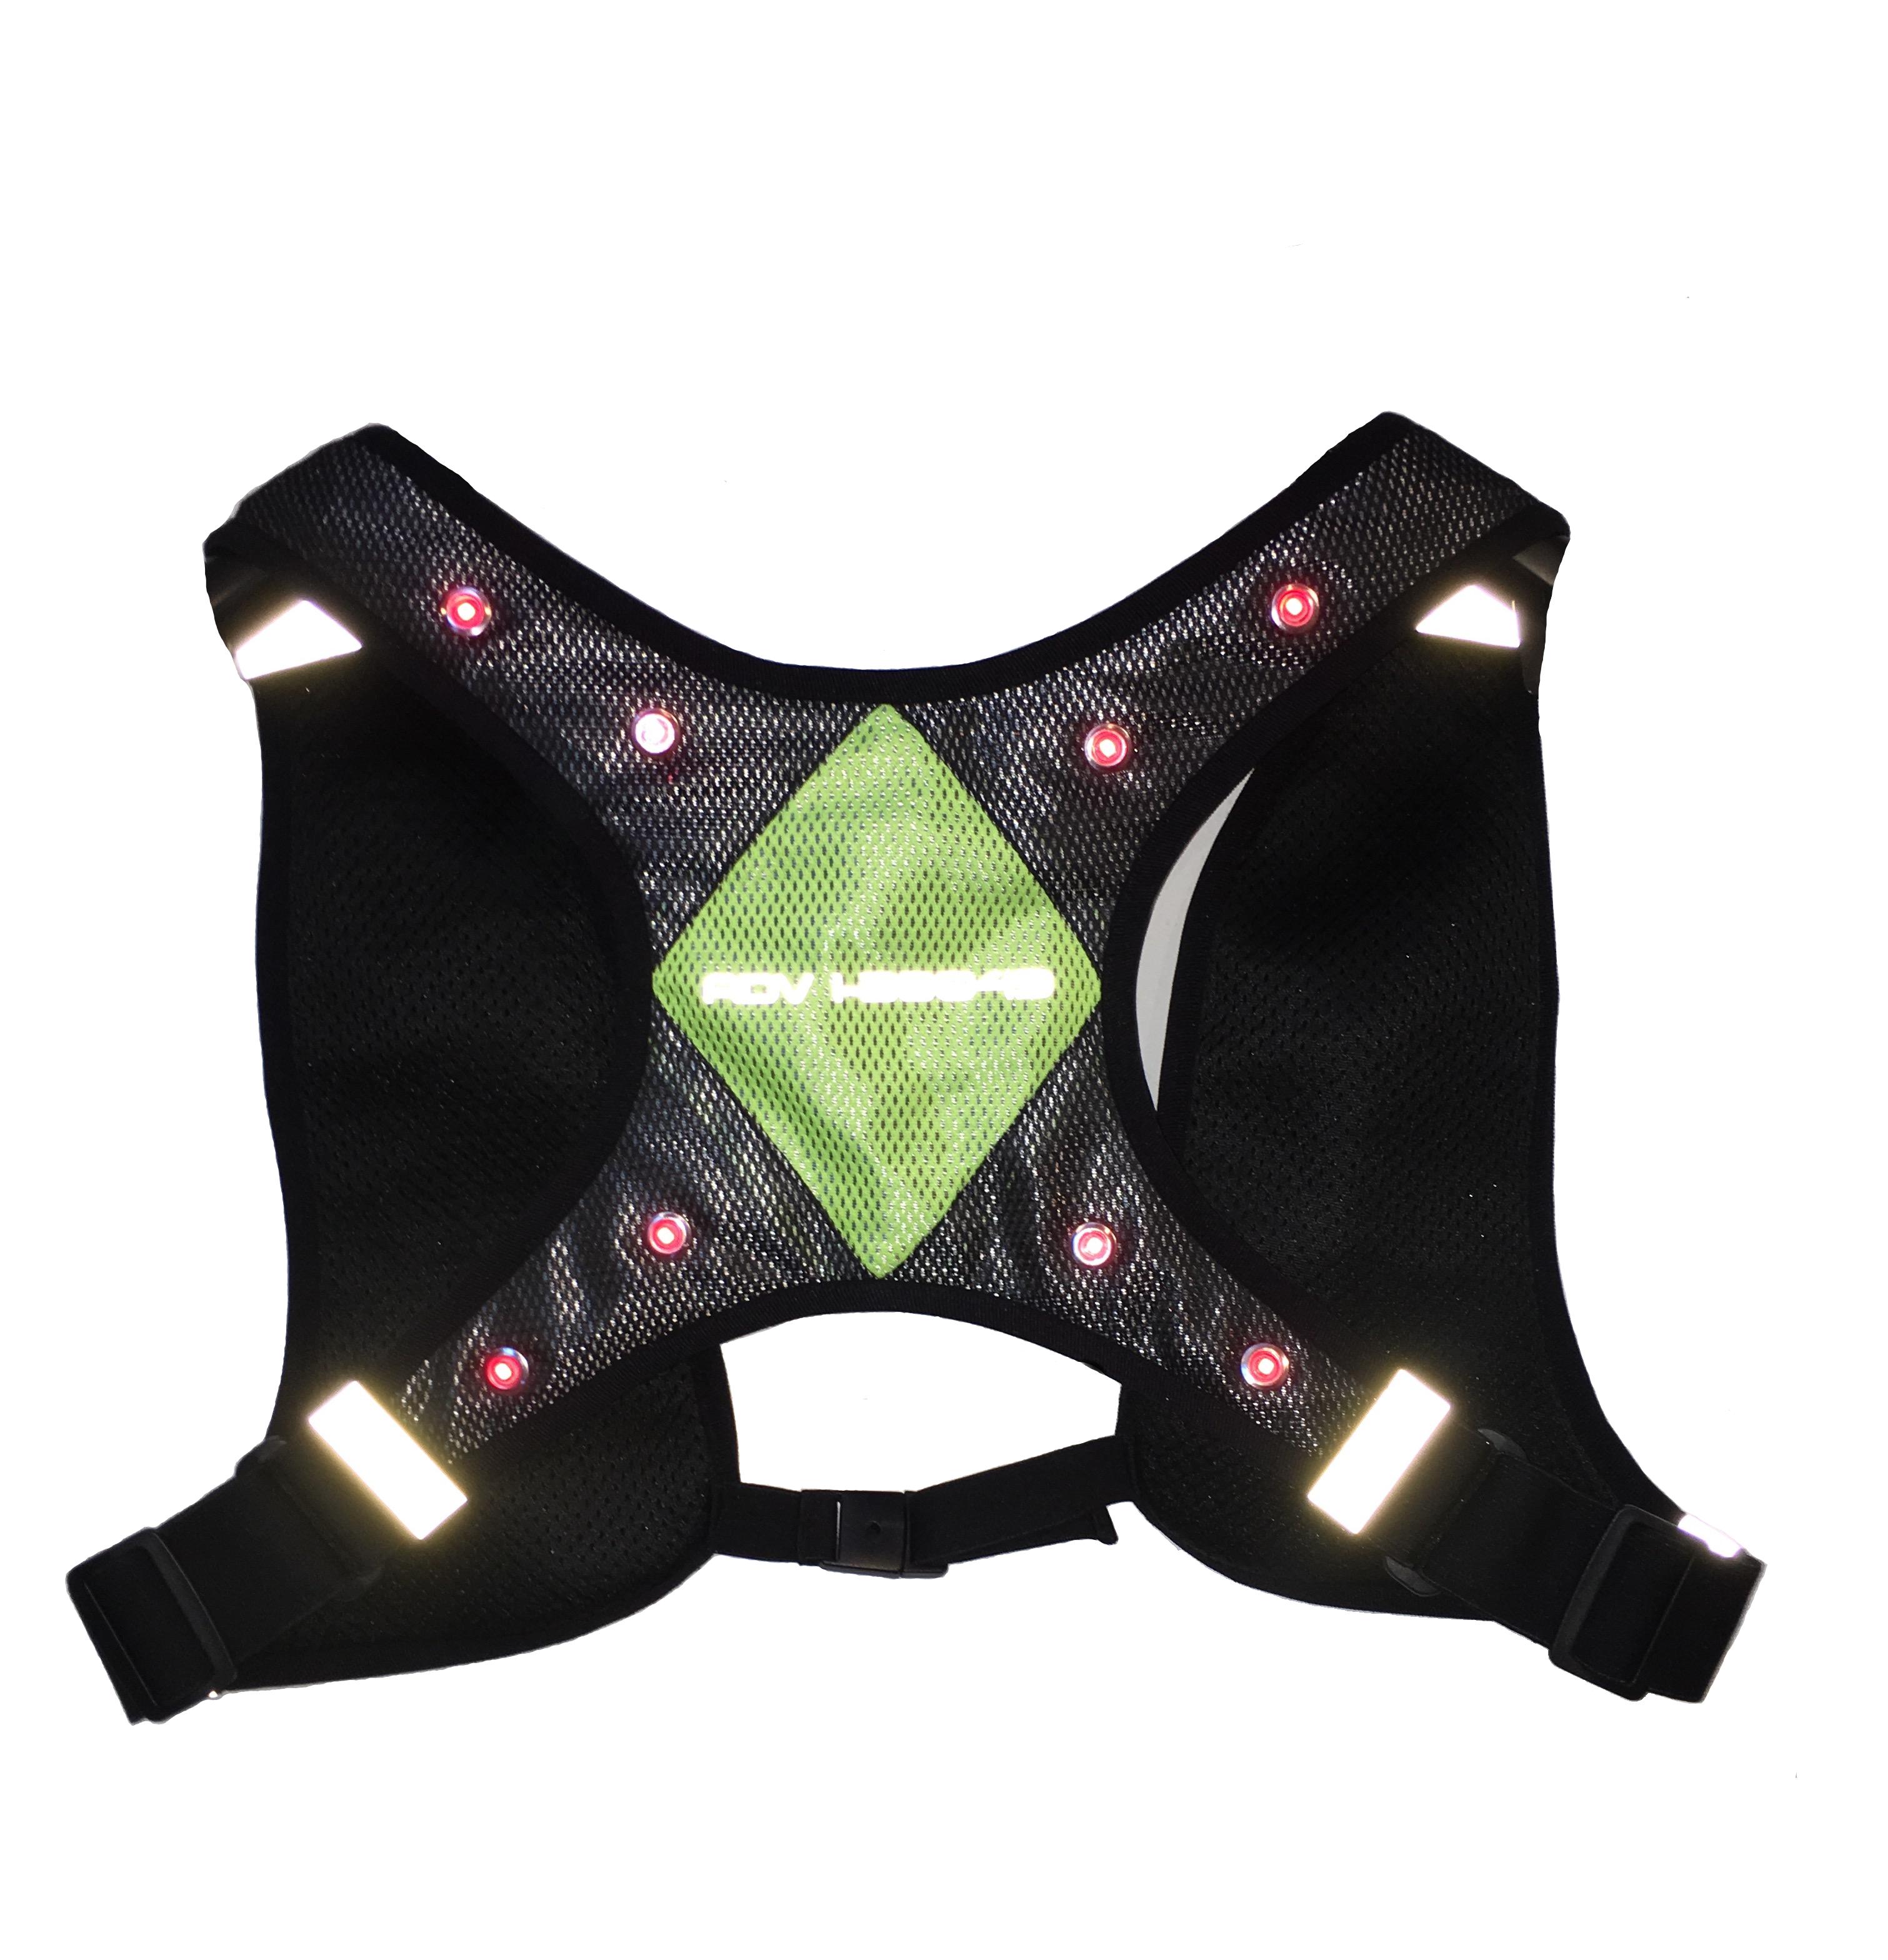 X- VISION rear